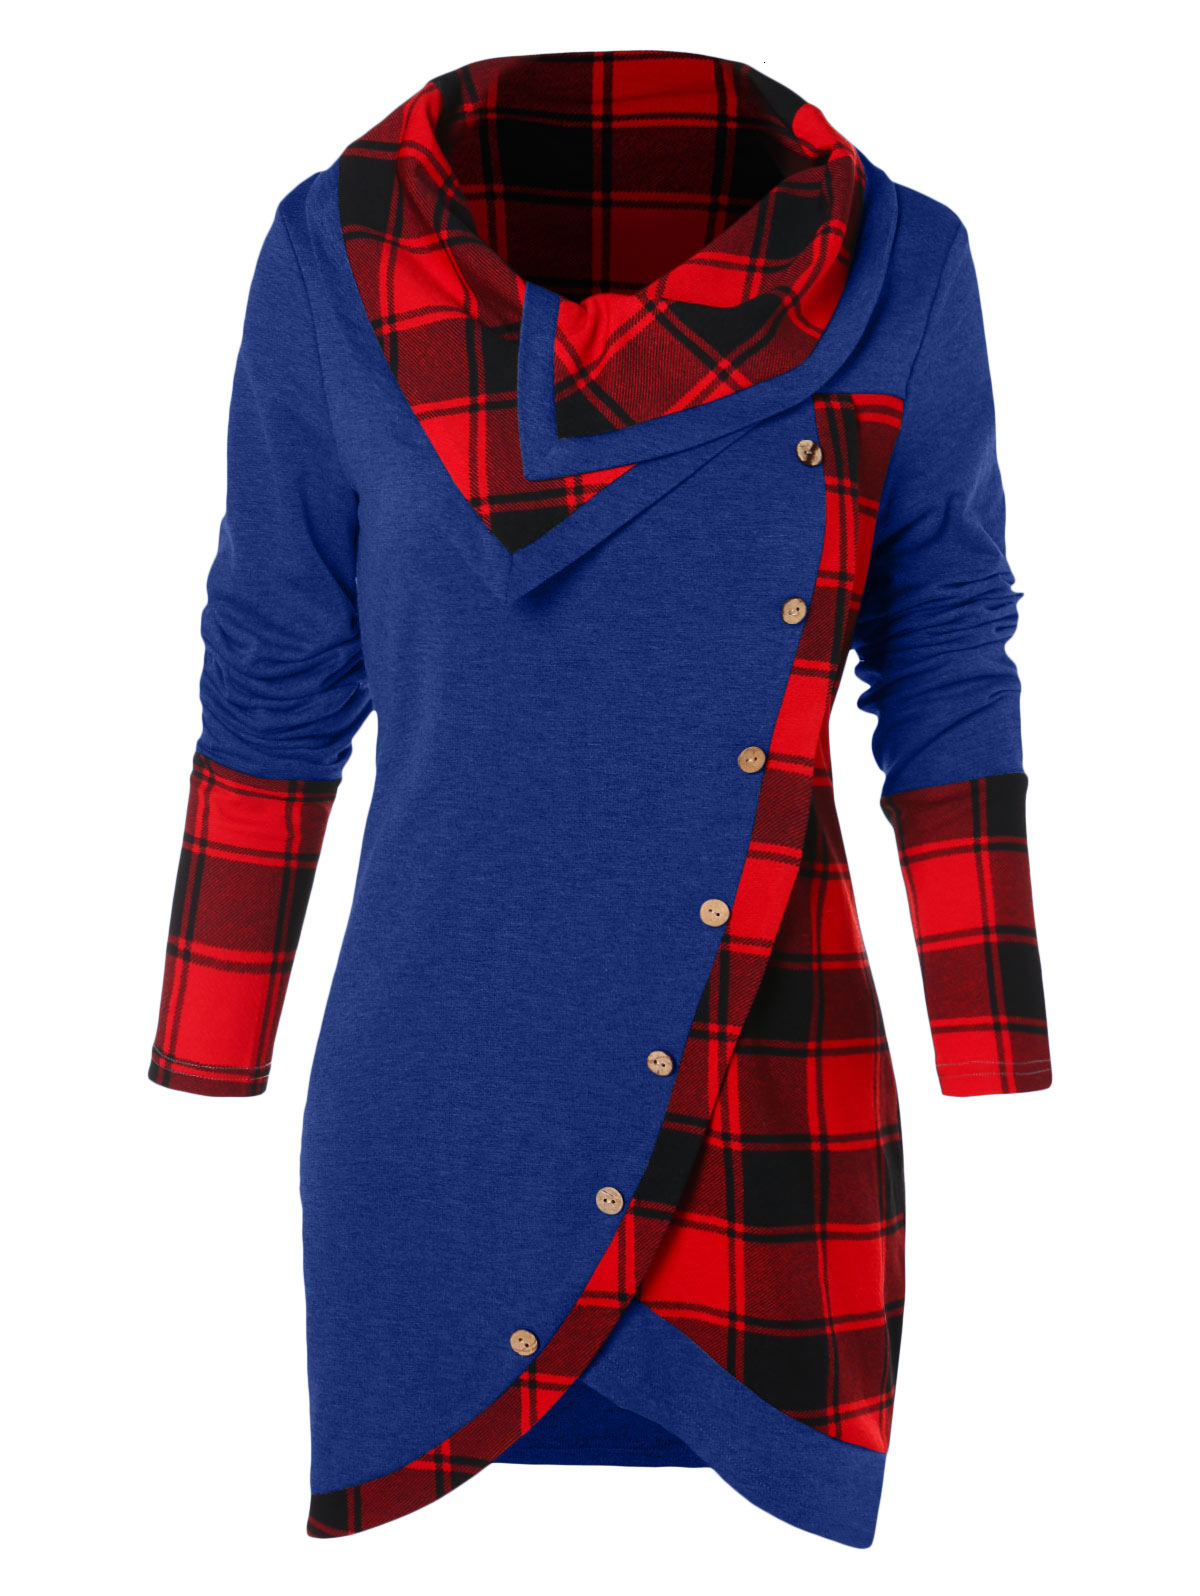 Women Clothes Women Shirts Plus Size Women T Shirt Casual Panel Long Sleeve Asymmetrical T Shirts Ladies Plaid Tops Tees Female Autumn